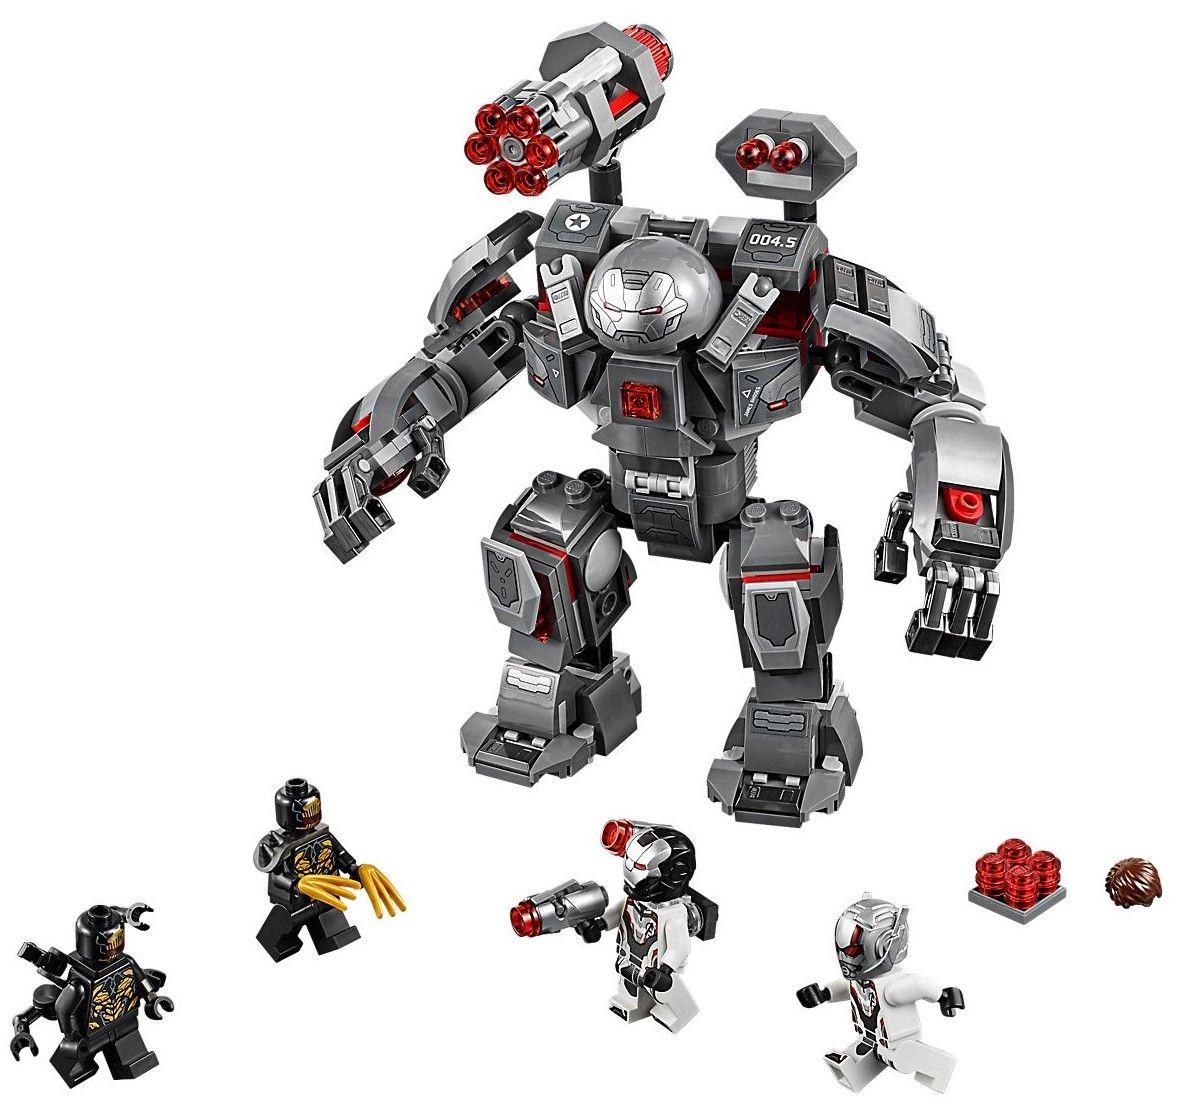 Конструктор Lego Marvel Super Heroes - War Machine Buster (76124) - 2